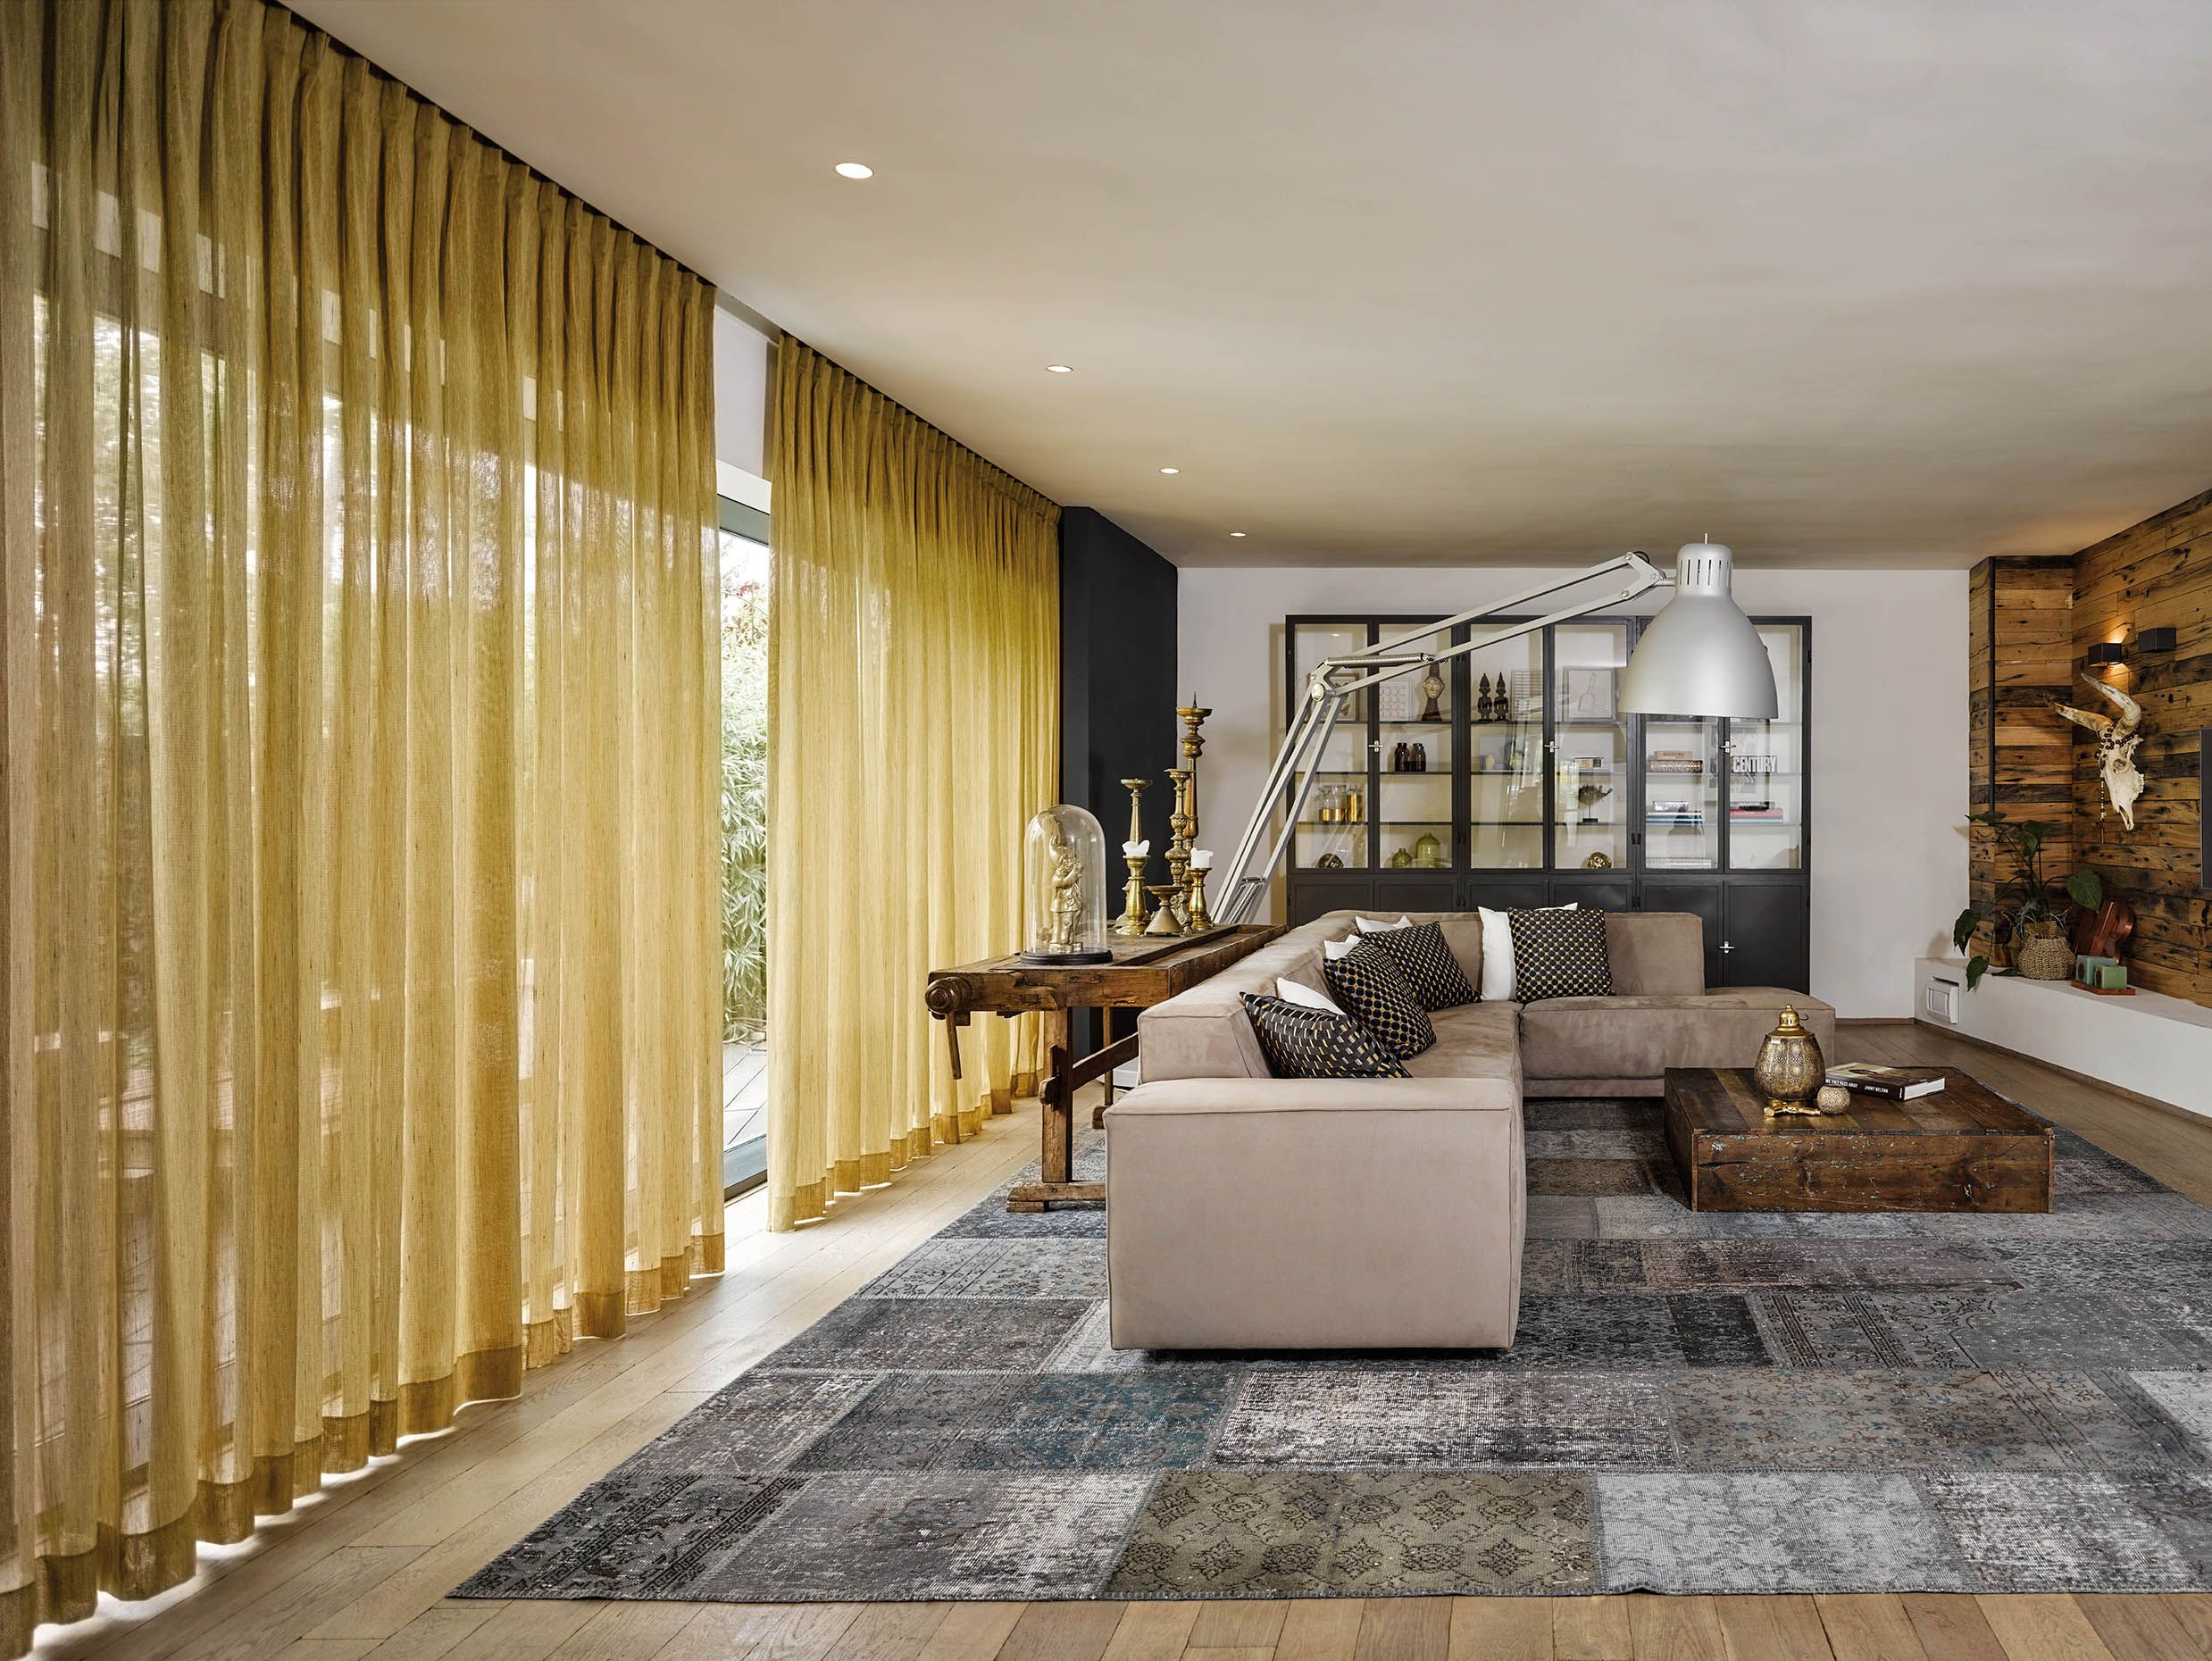 gordijnen #inbetween #stoffen #interieur #decoratie #bekleding ...